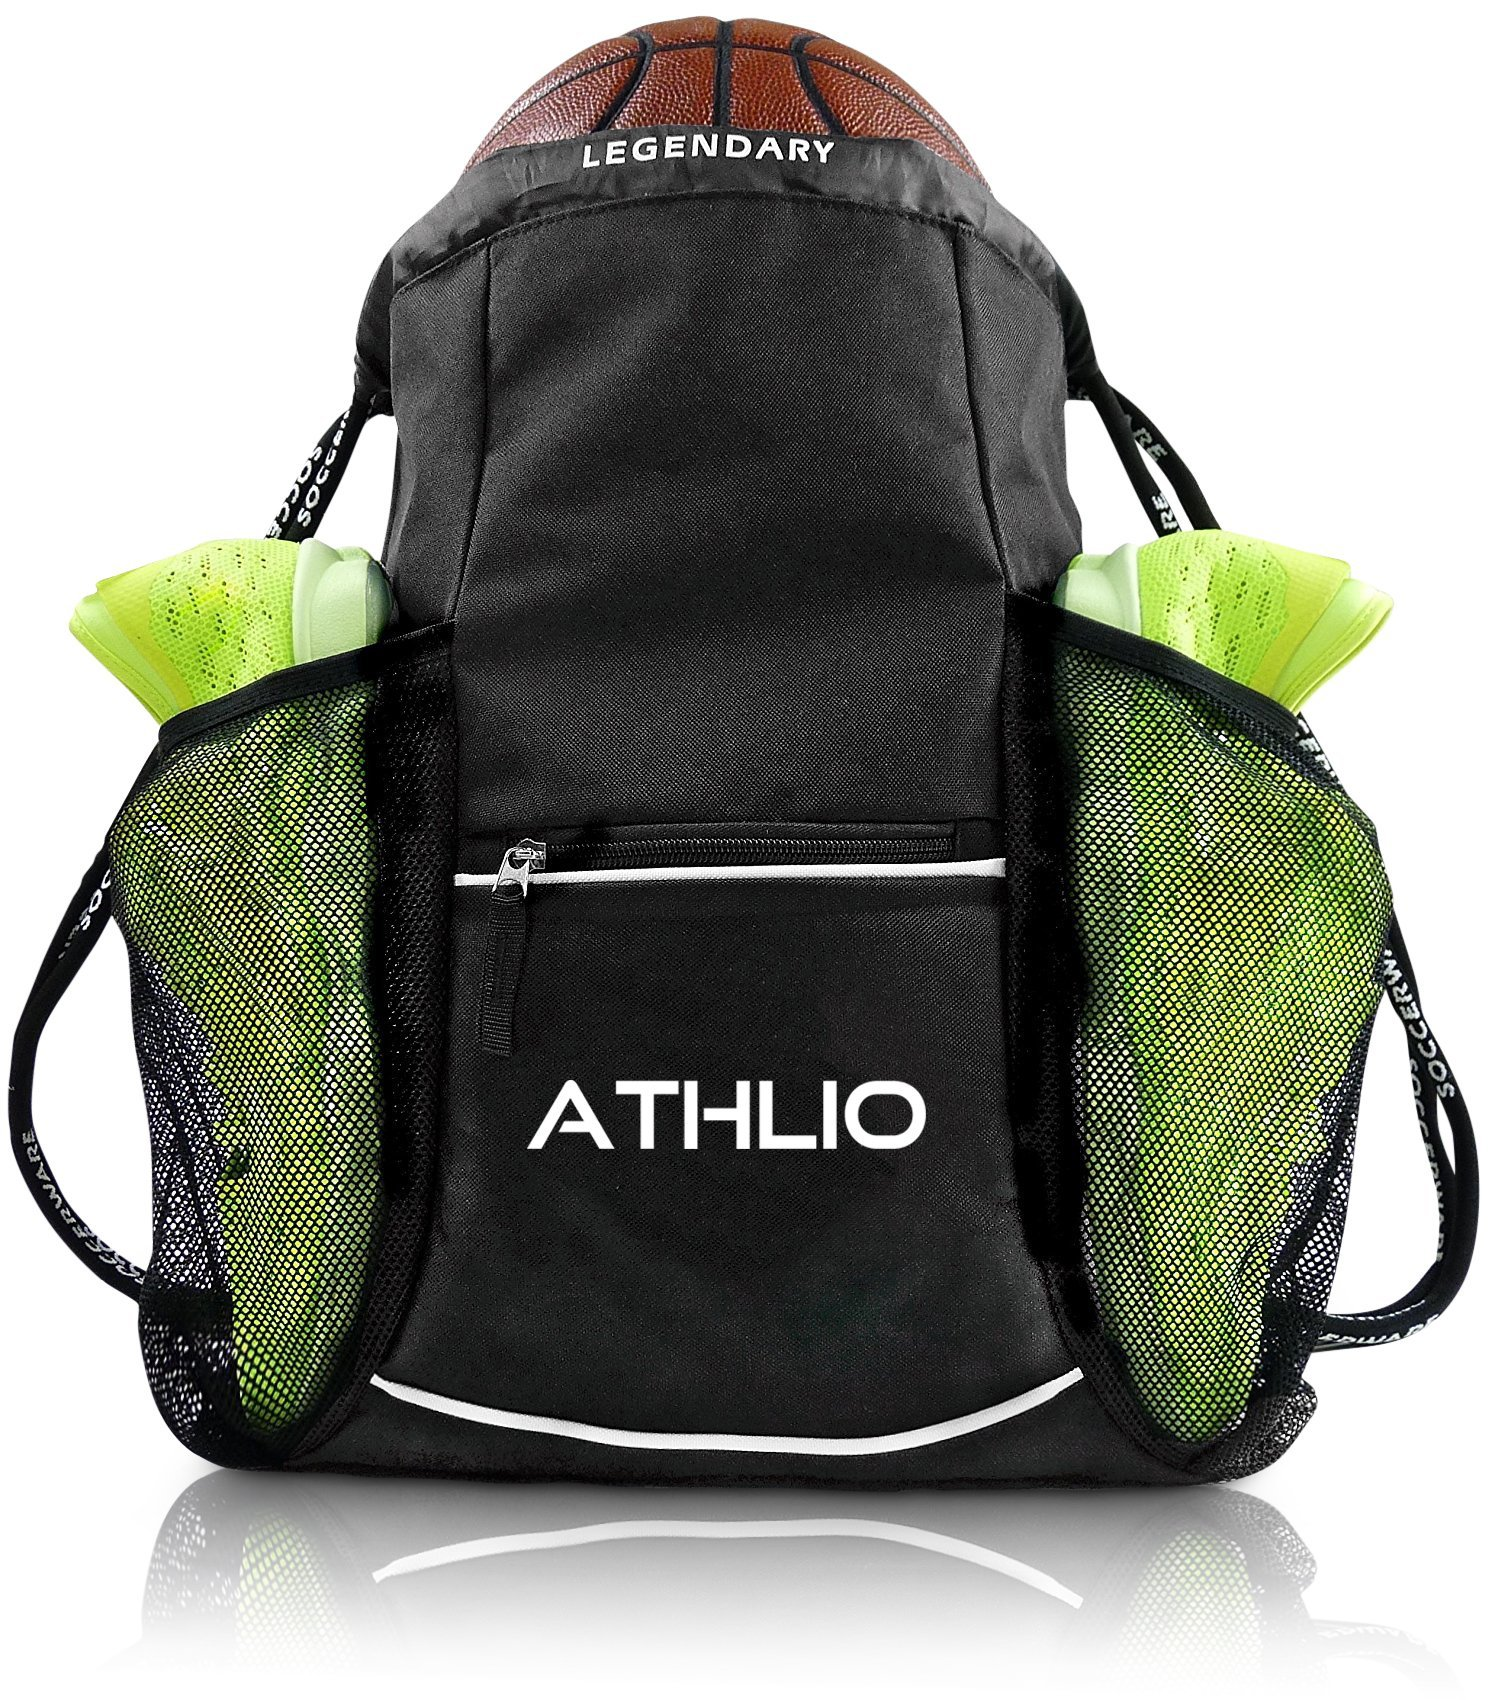 Legendary Drawstring Gym Bag - XL Capacity | Fits All Sports Gear | Waterproof Heavy-Duty Sackpack/Backpack (Black)